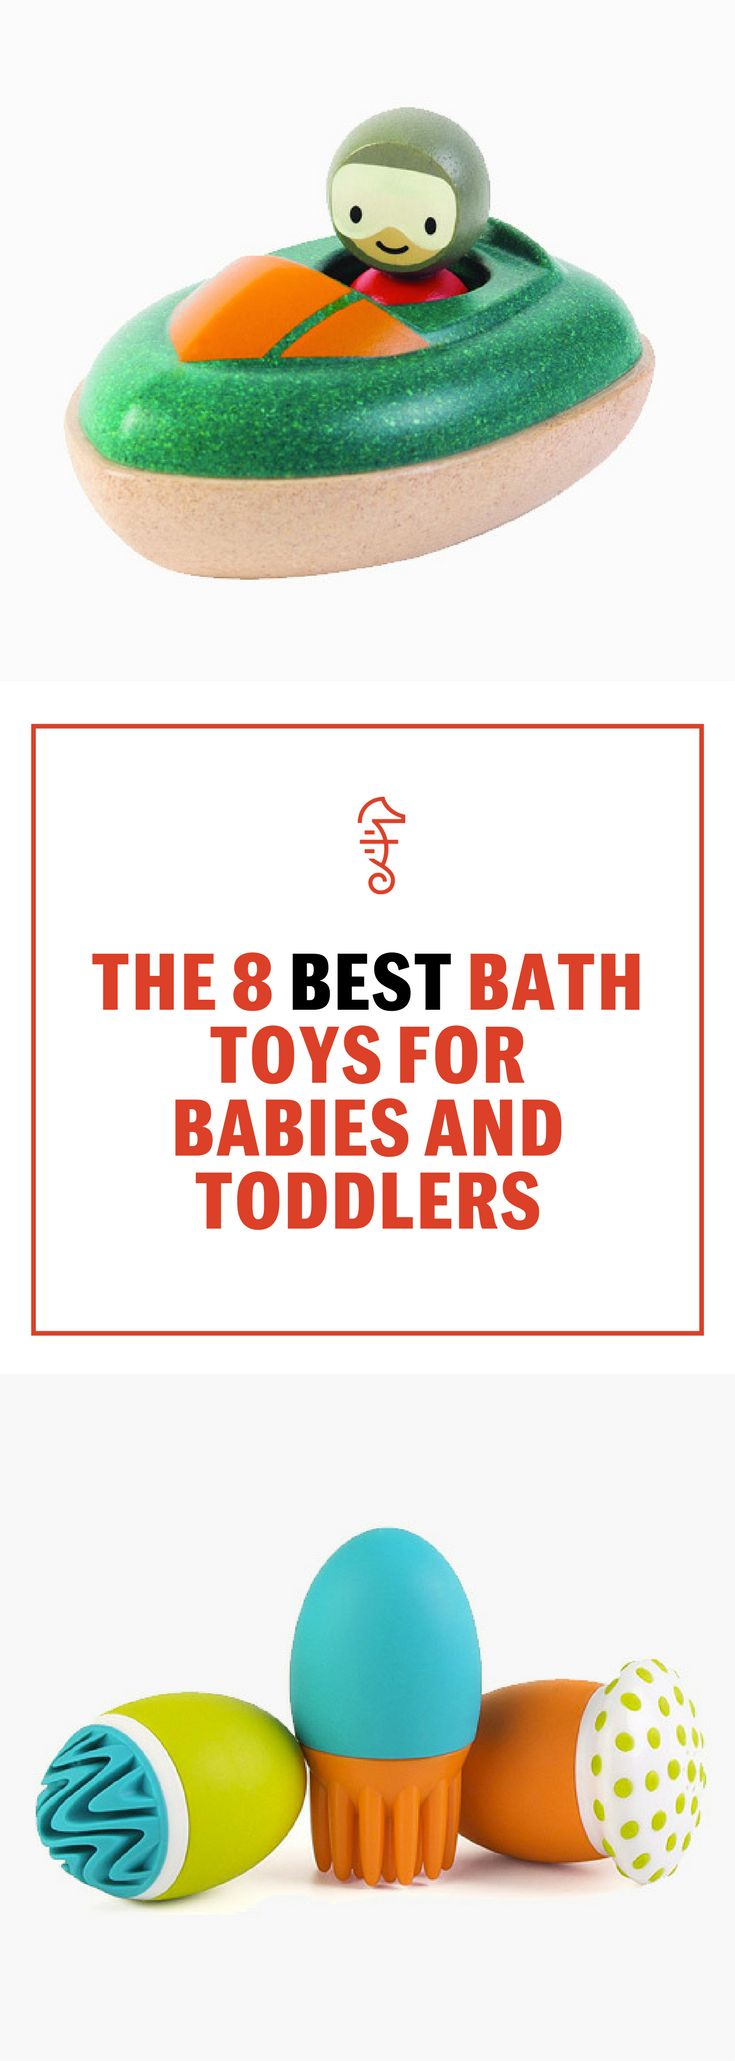 Bath toys, bath toys for baby, bath toys for toddlers, bath toys for kids, bath toys kids